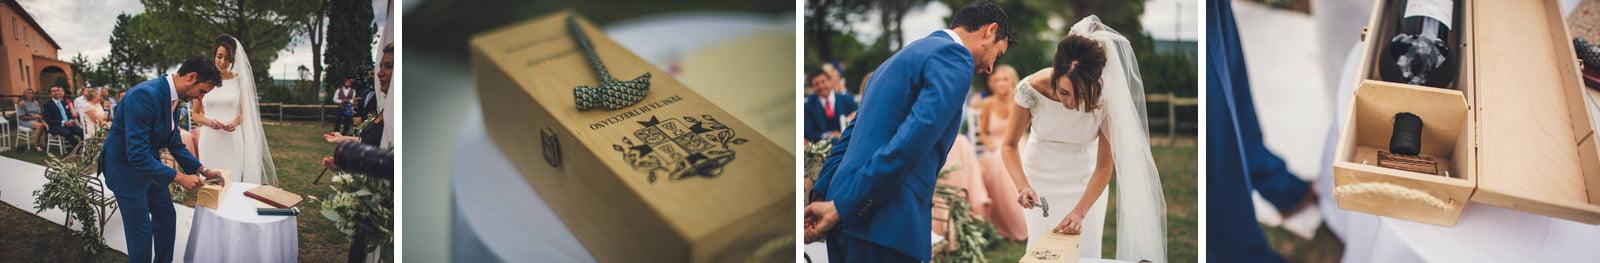 058-wedding-tuscany-san-galgano-federico-pannacci-photographer